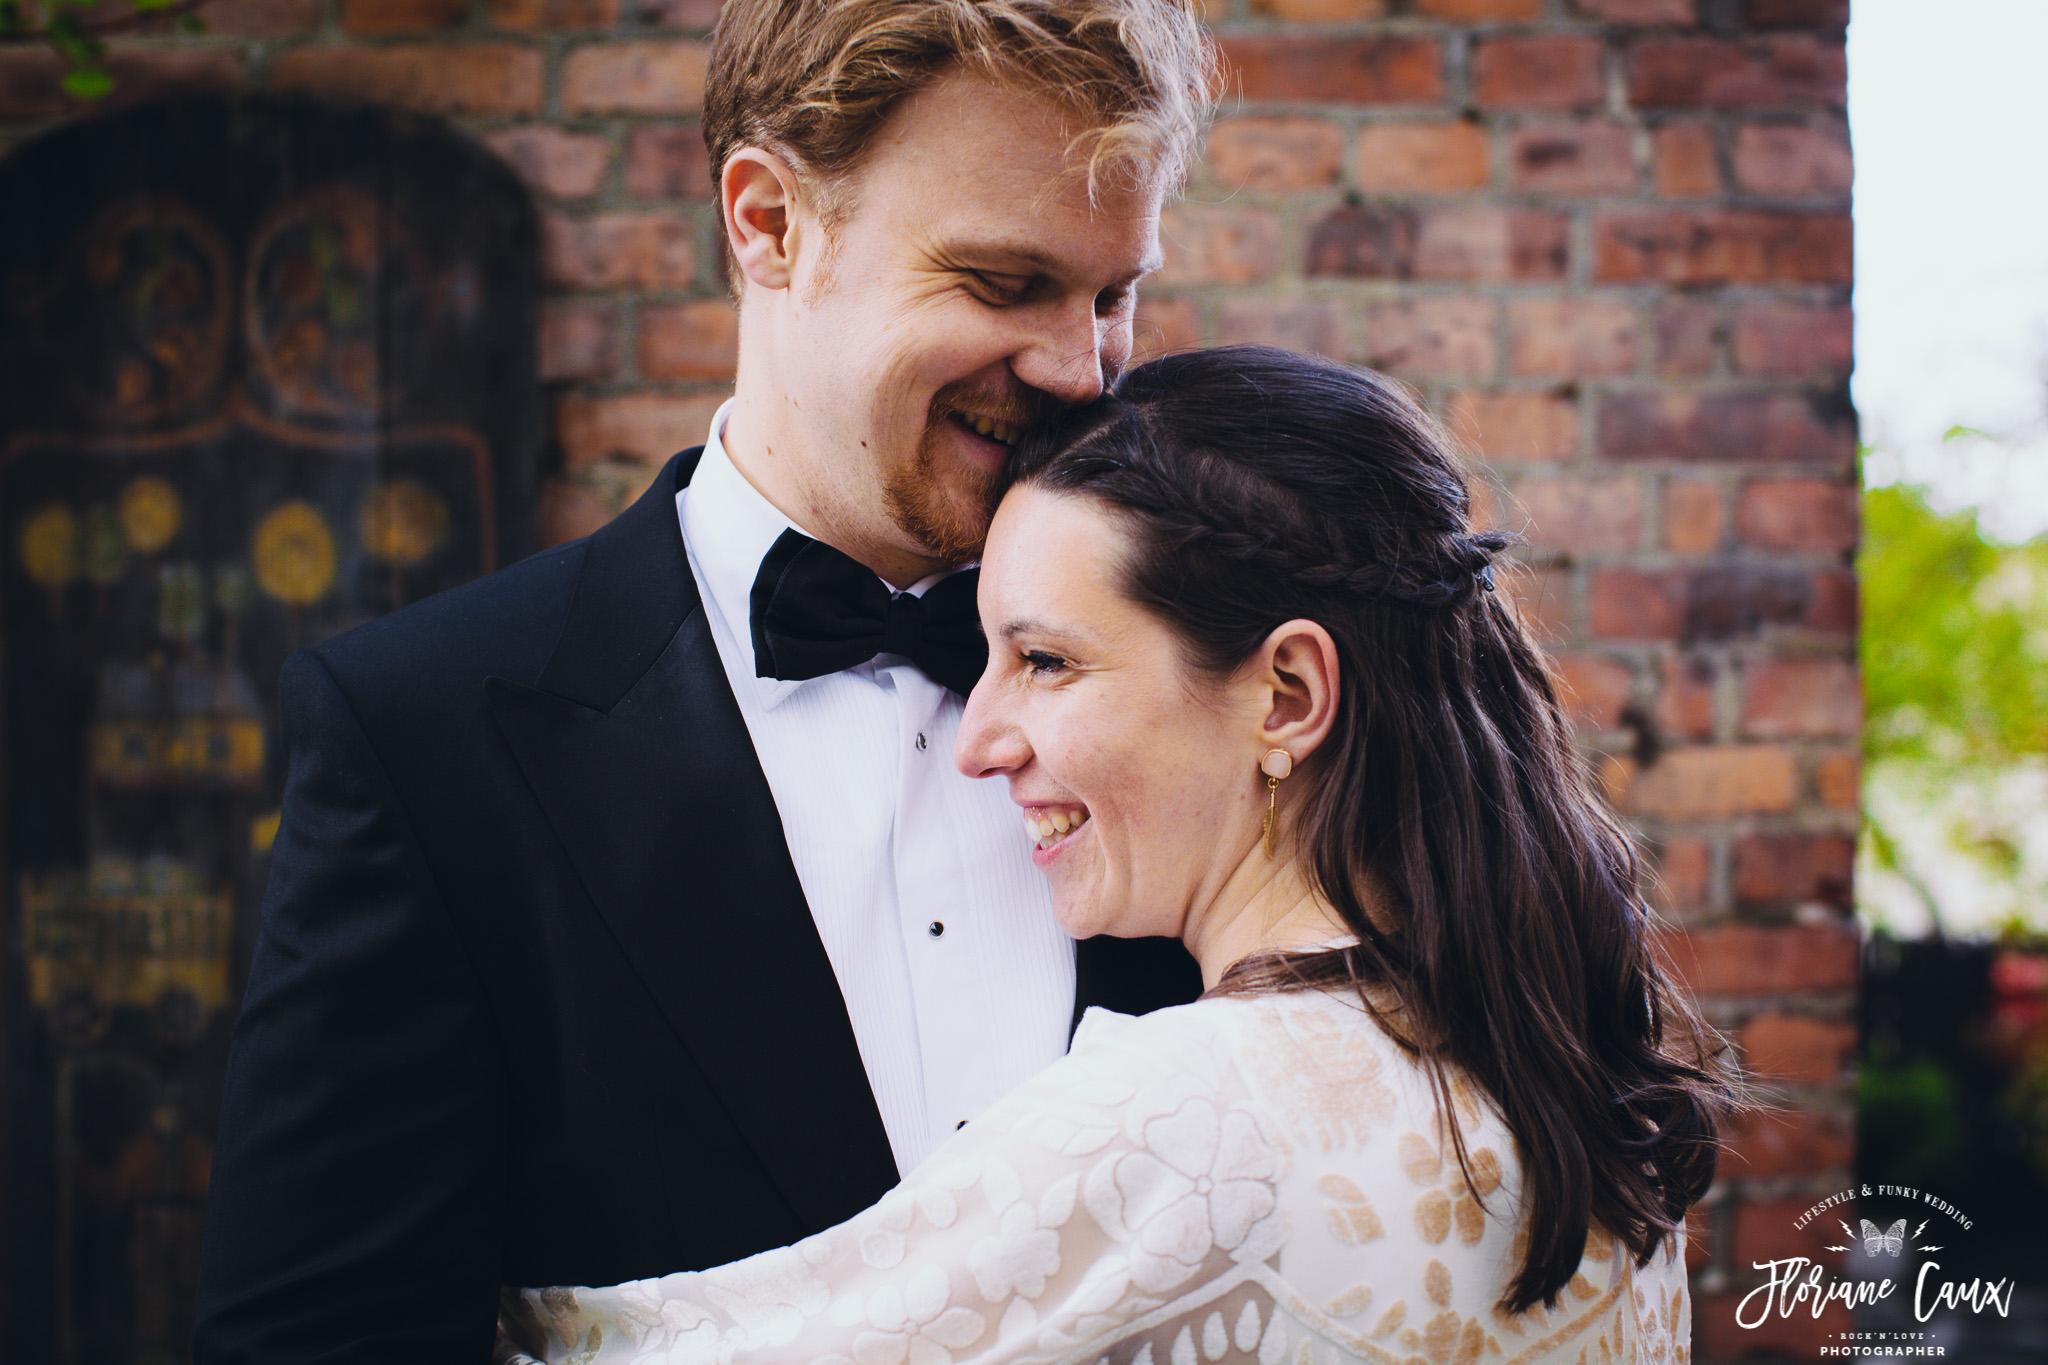 destination-wedding-photographer-oslo-norway-floriane-caux-21